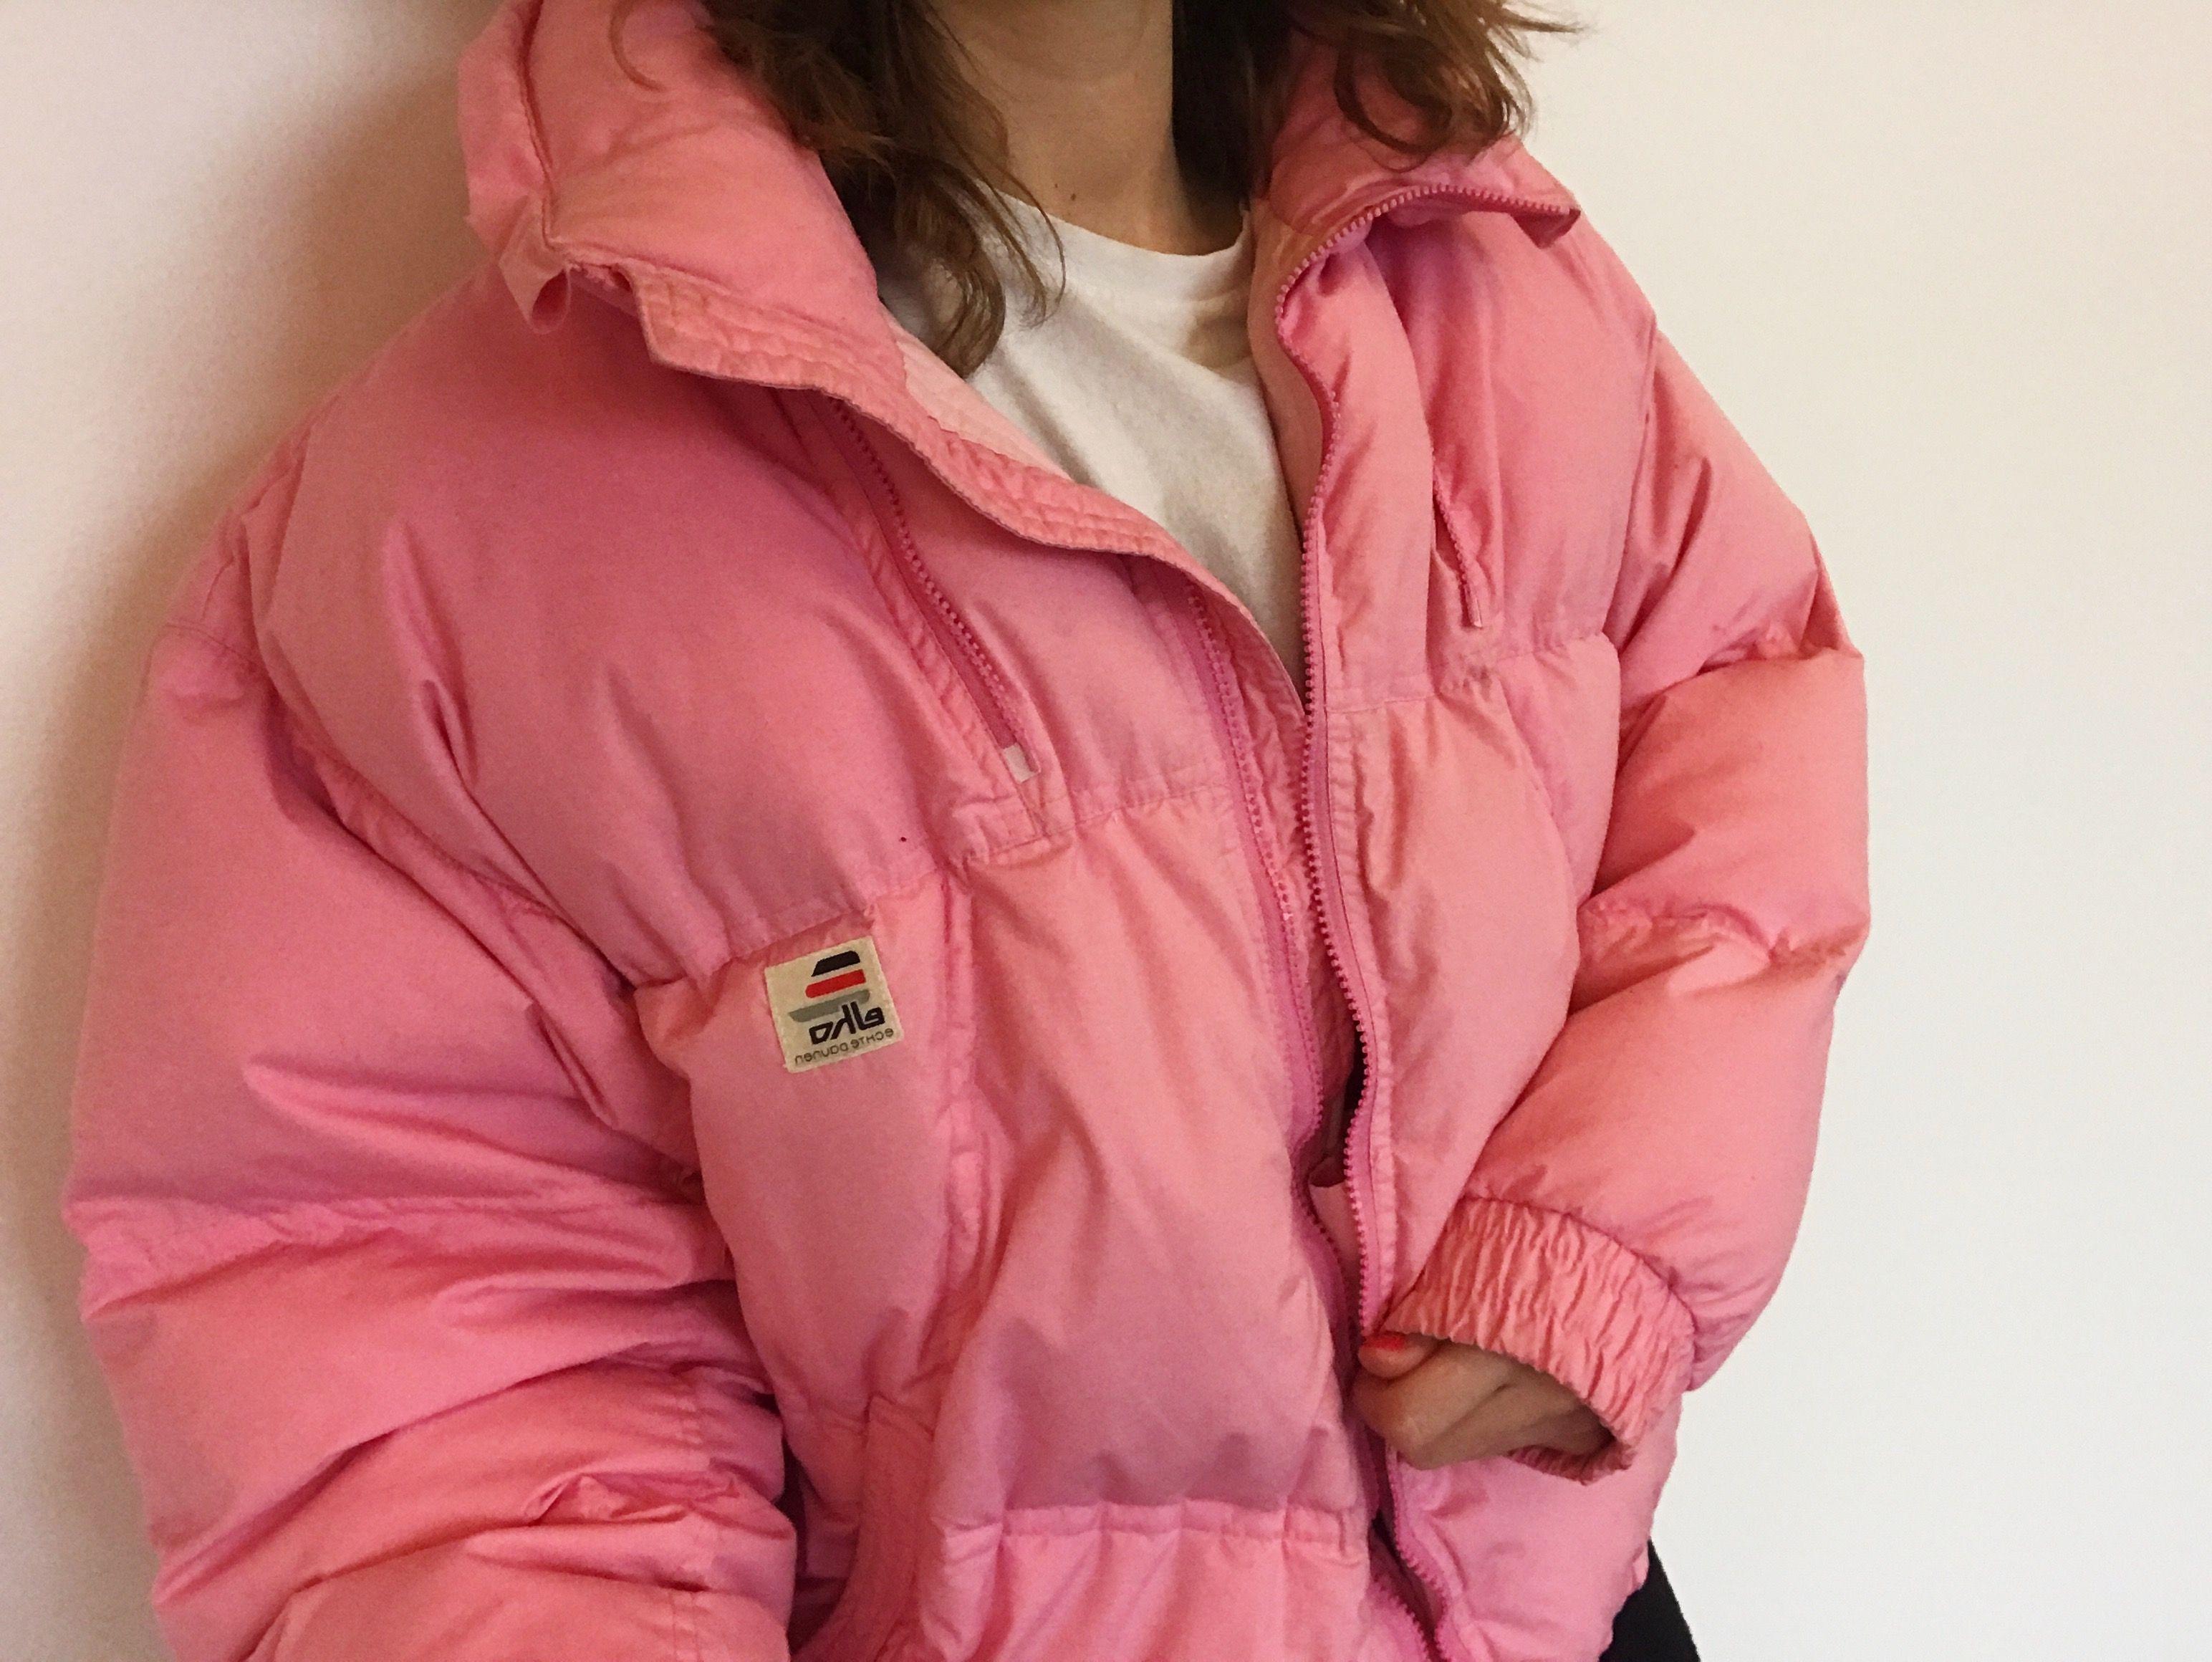 b5aeb441a Vintage Pink Puffer Jacket | thriftoff.com | Vintage ski jacket ...